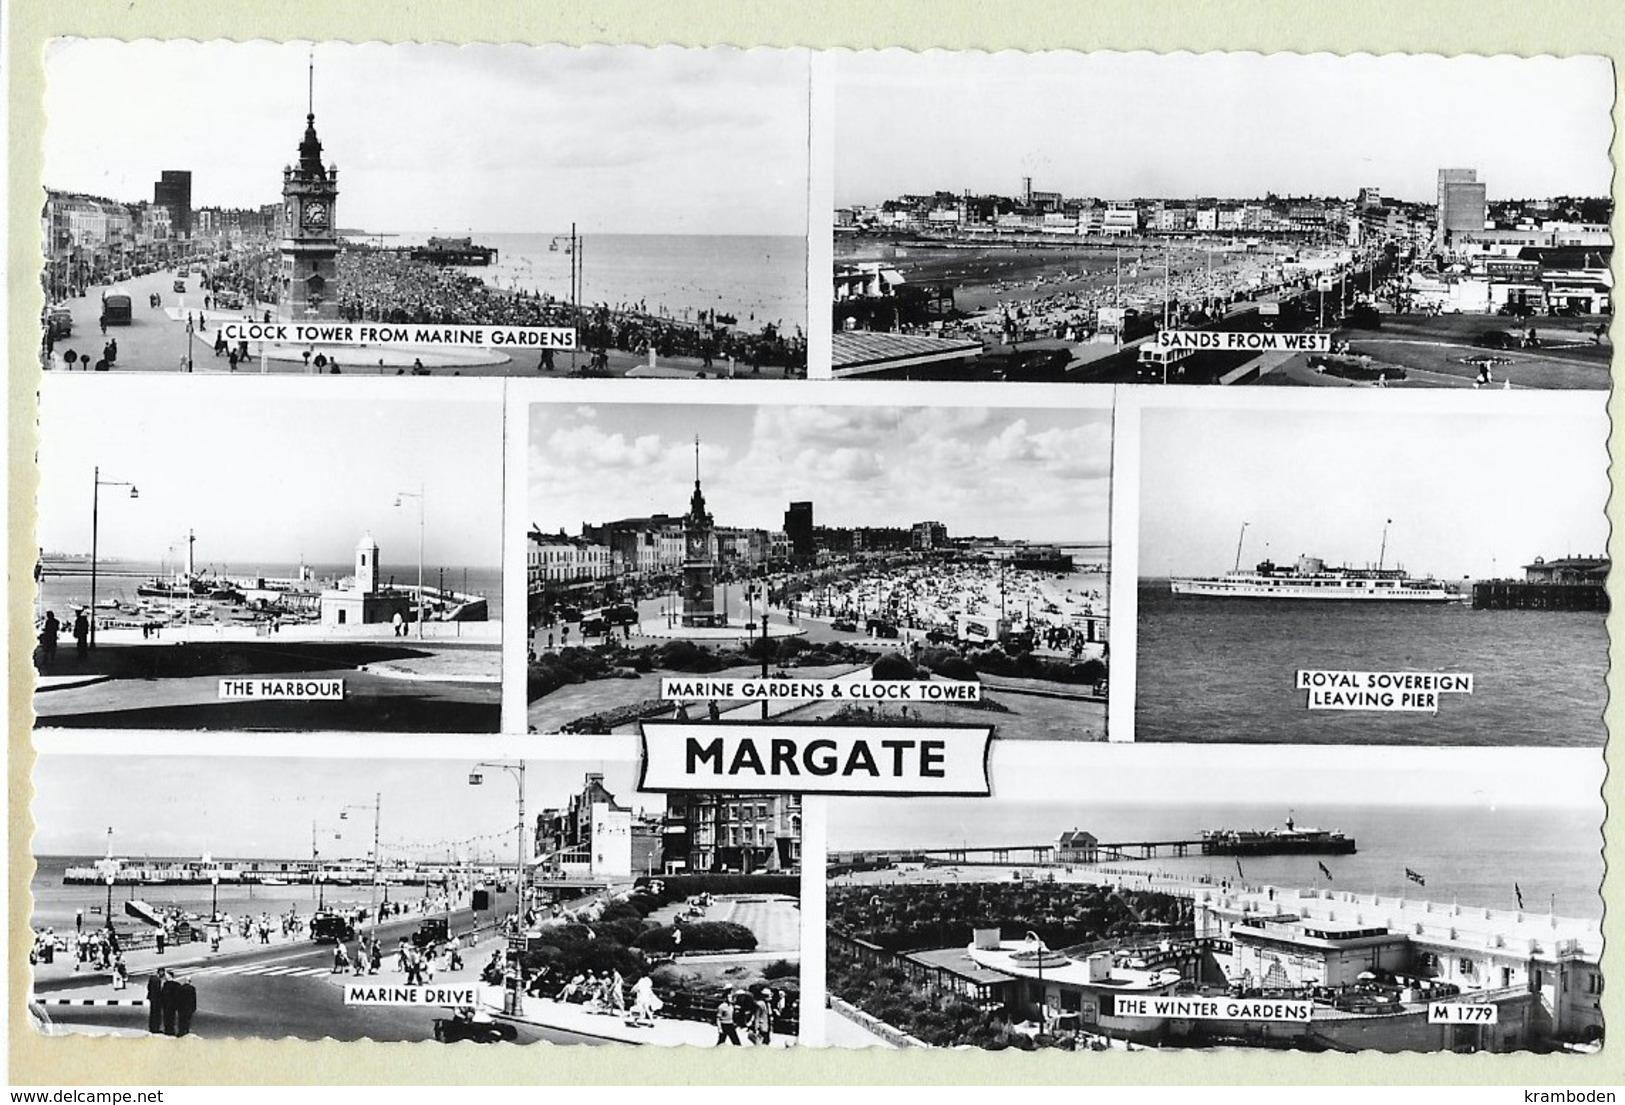 Margate 1964 Real Photo - Margate